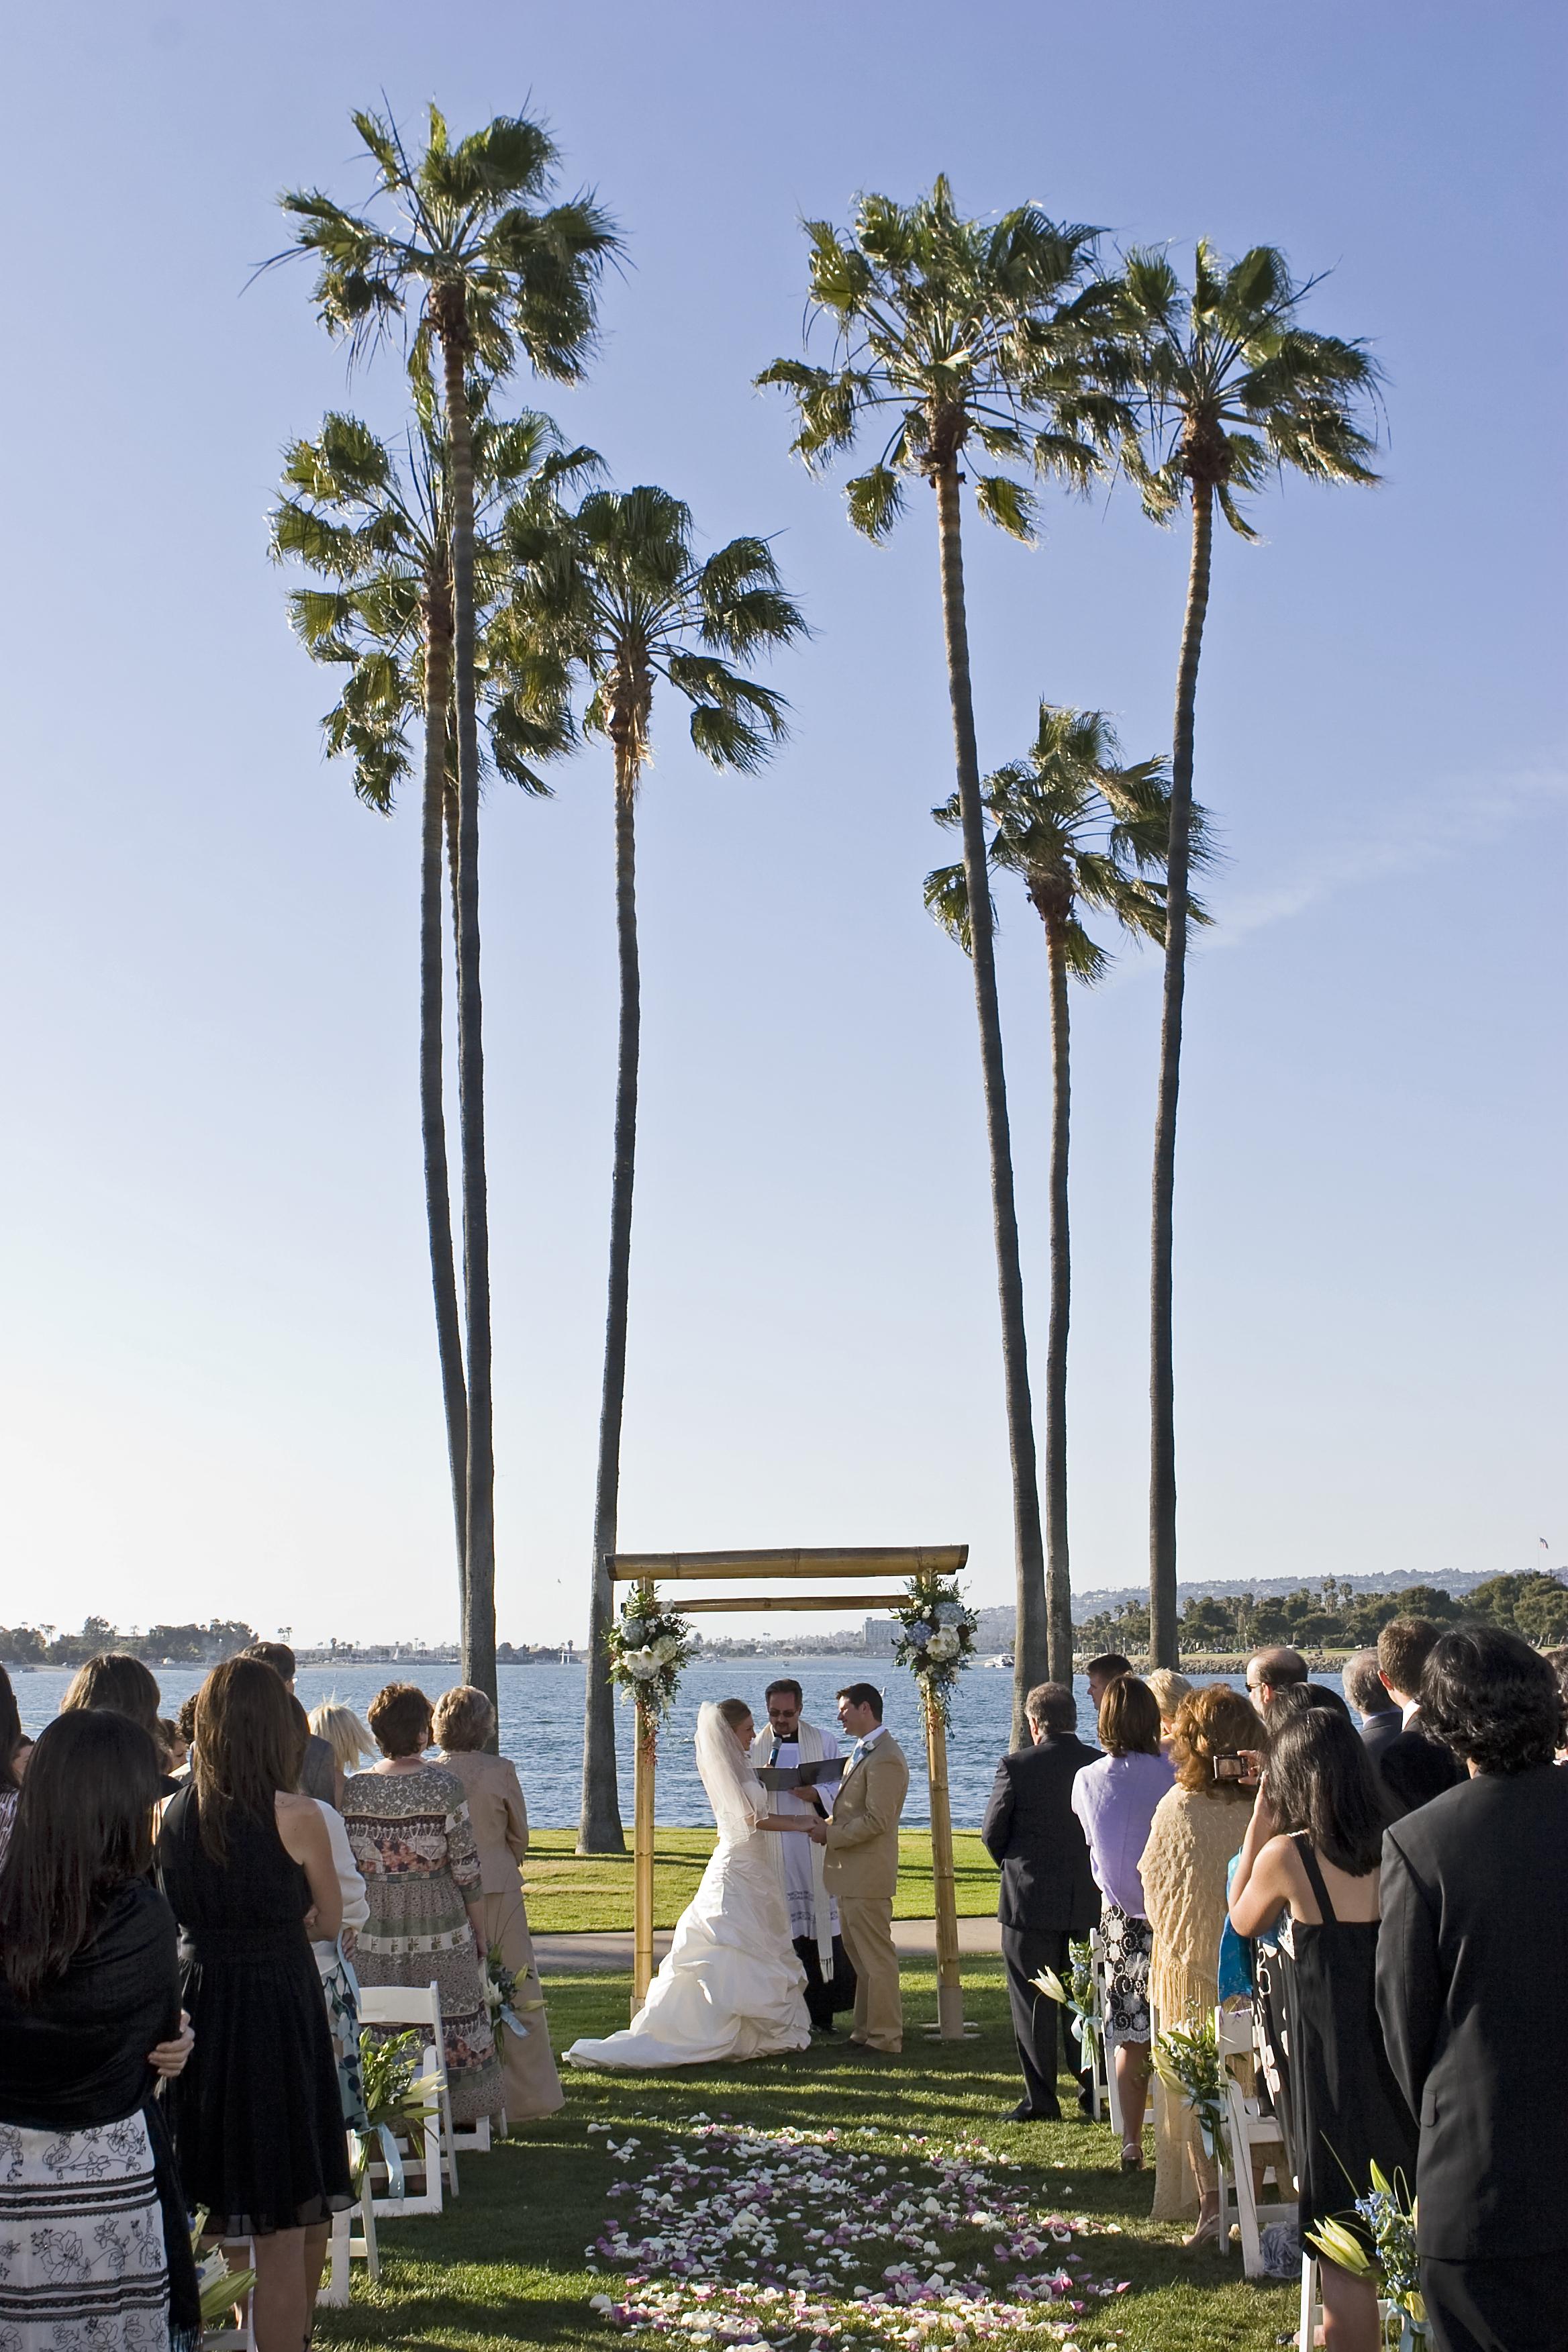 Ceremony at The Dana, Mission Bay